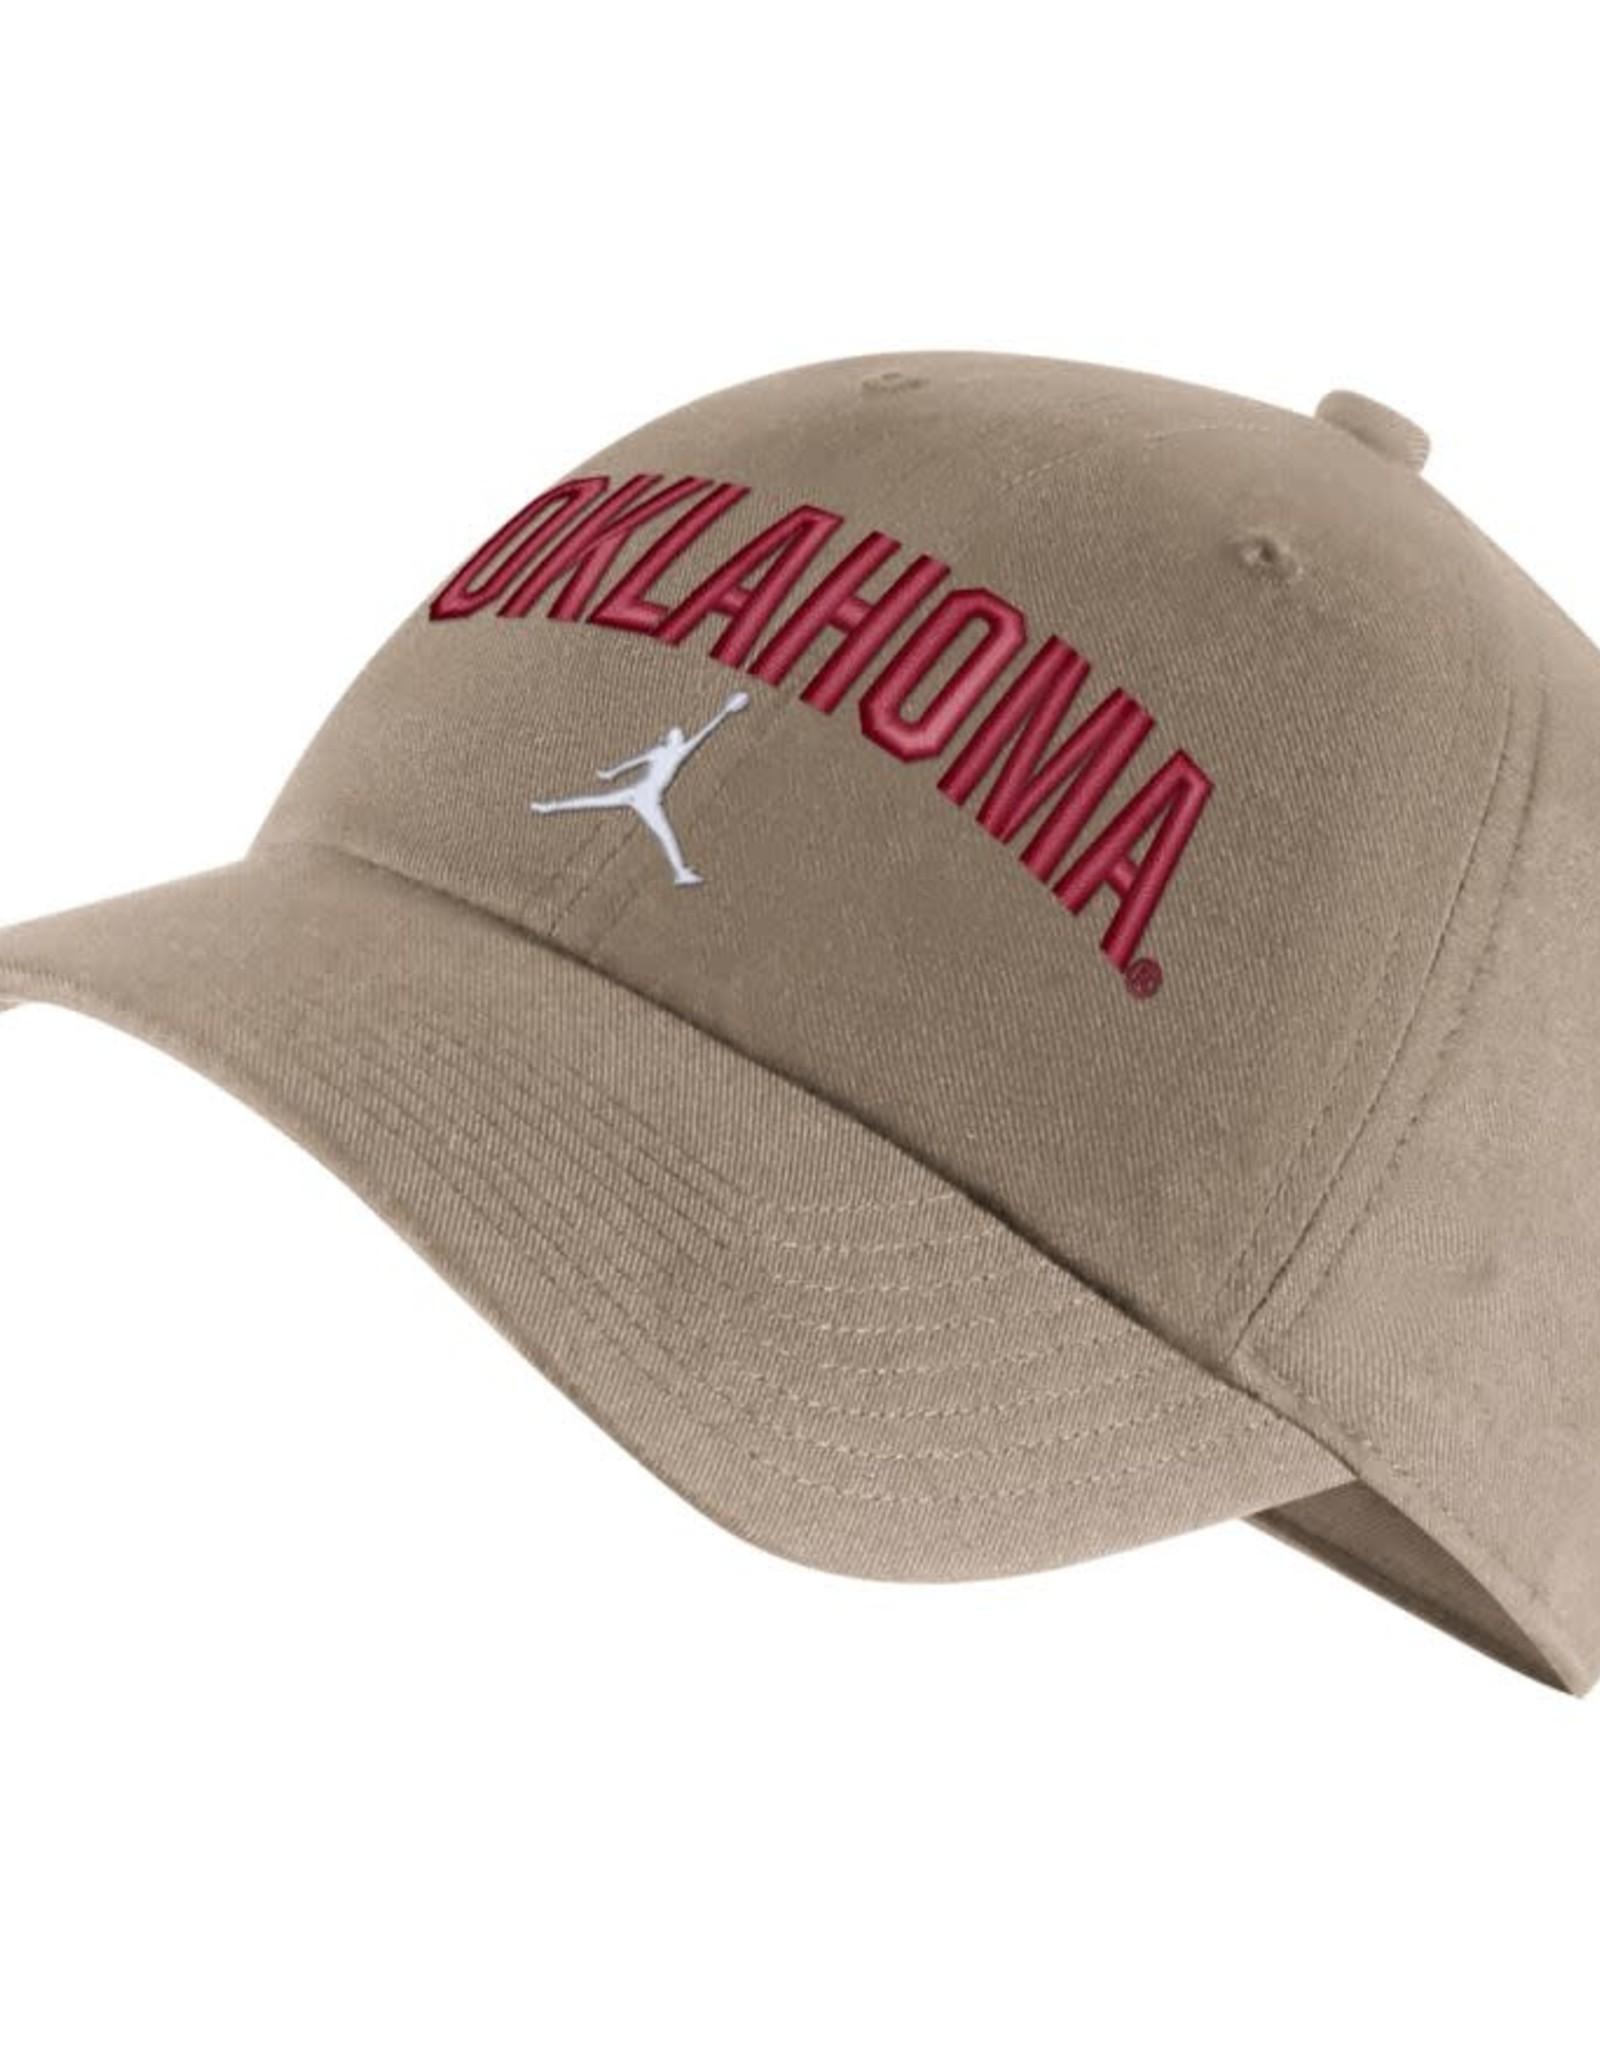 Jordan Jordan Brand H86 Arch Oklahoma Adjustable Cap